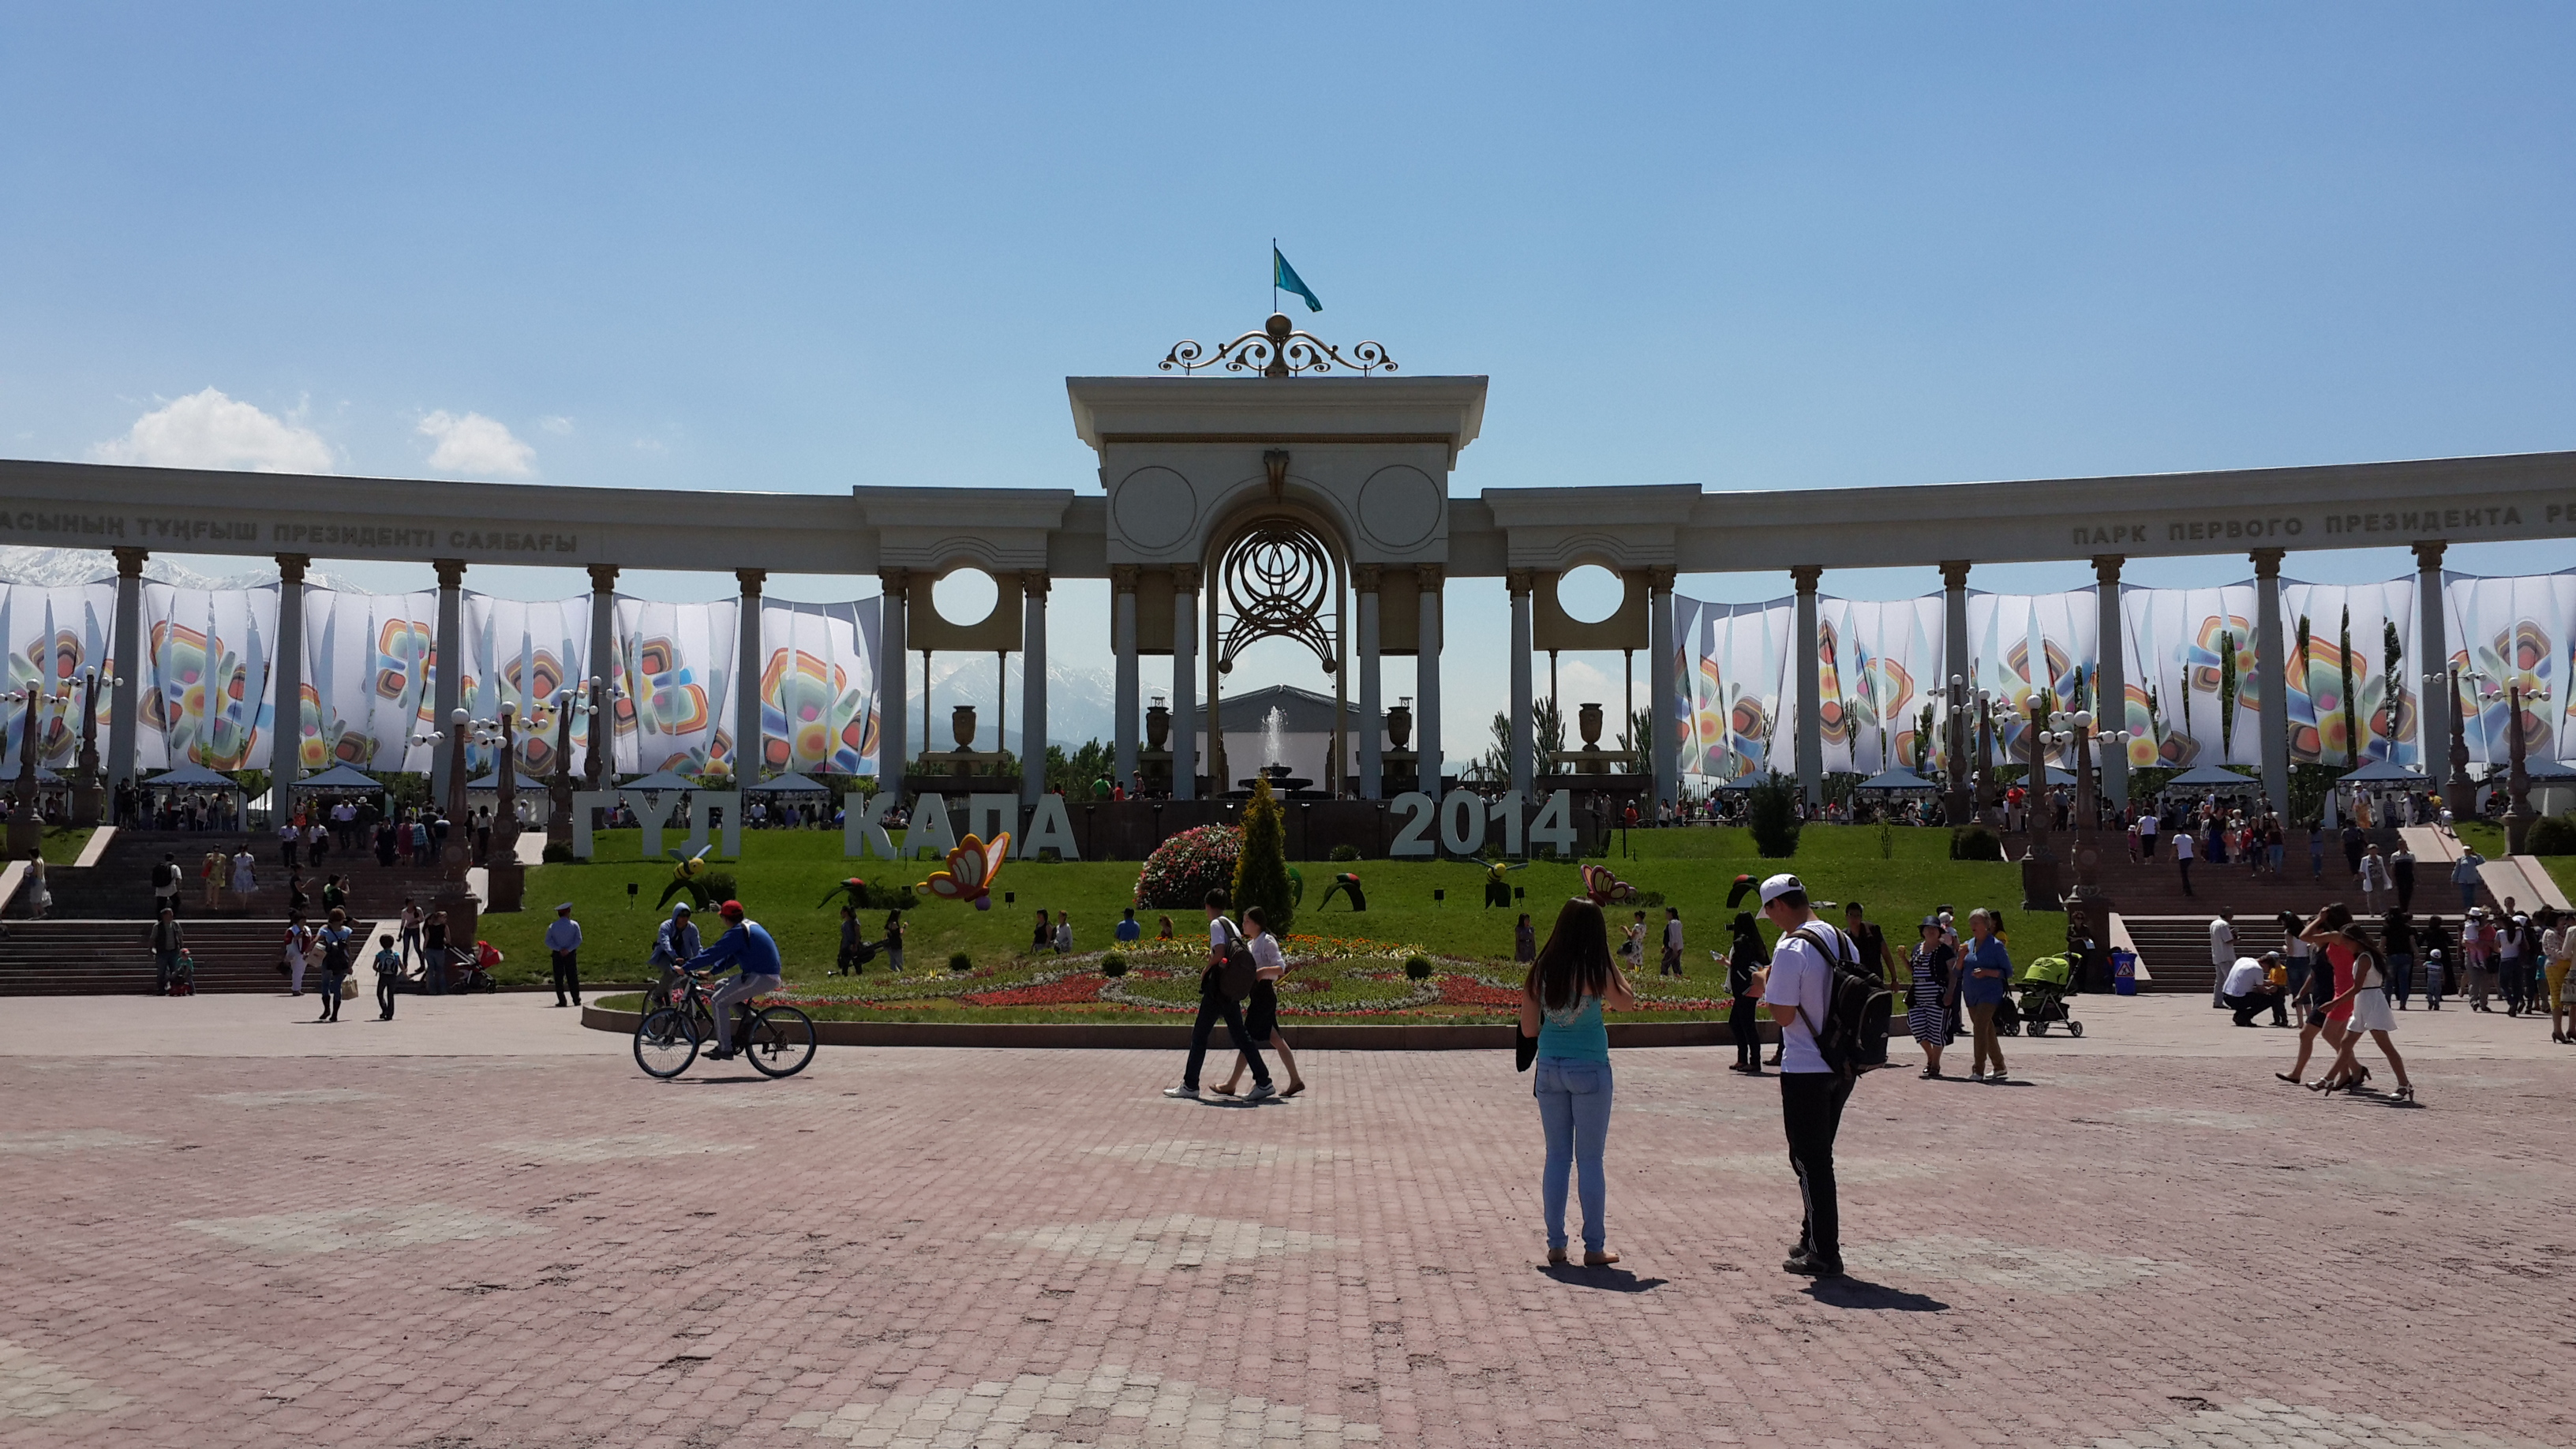 First President's Park in Almaty, Kazakhstan.